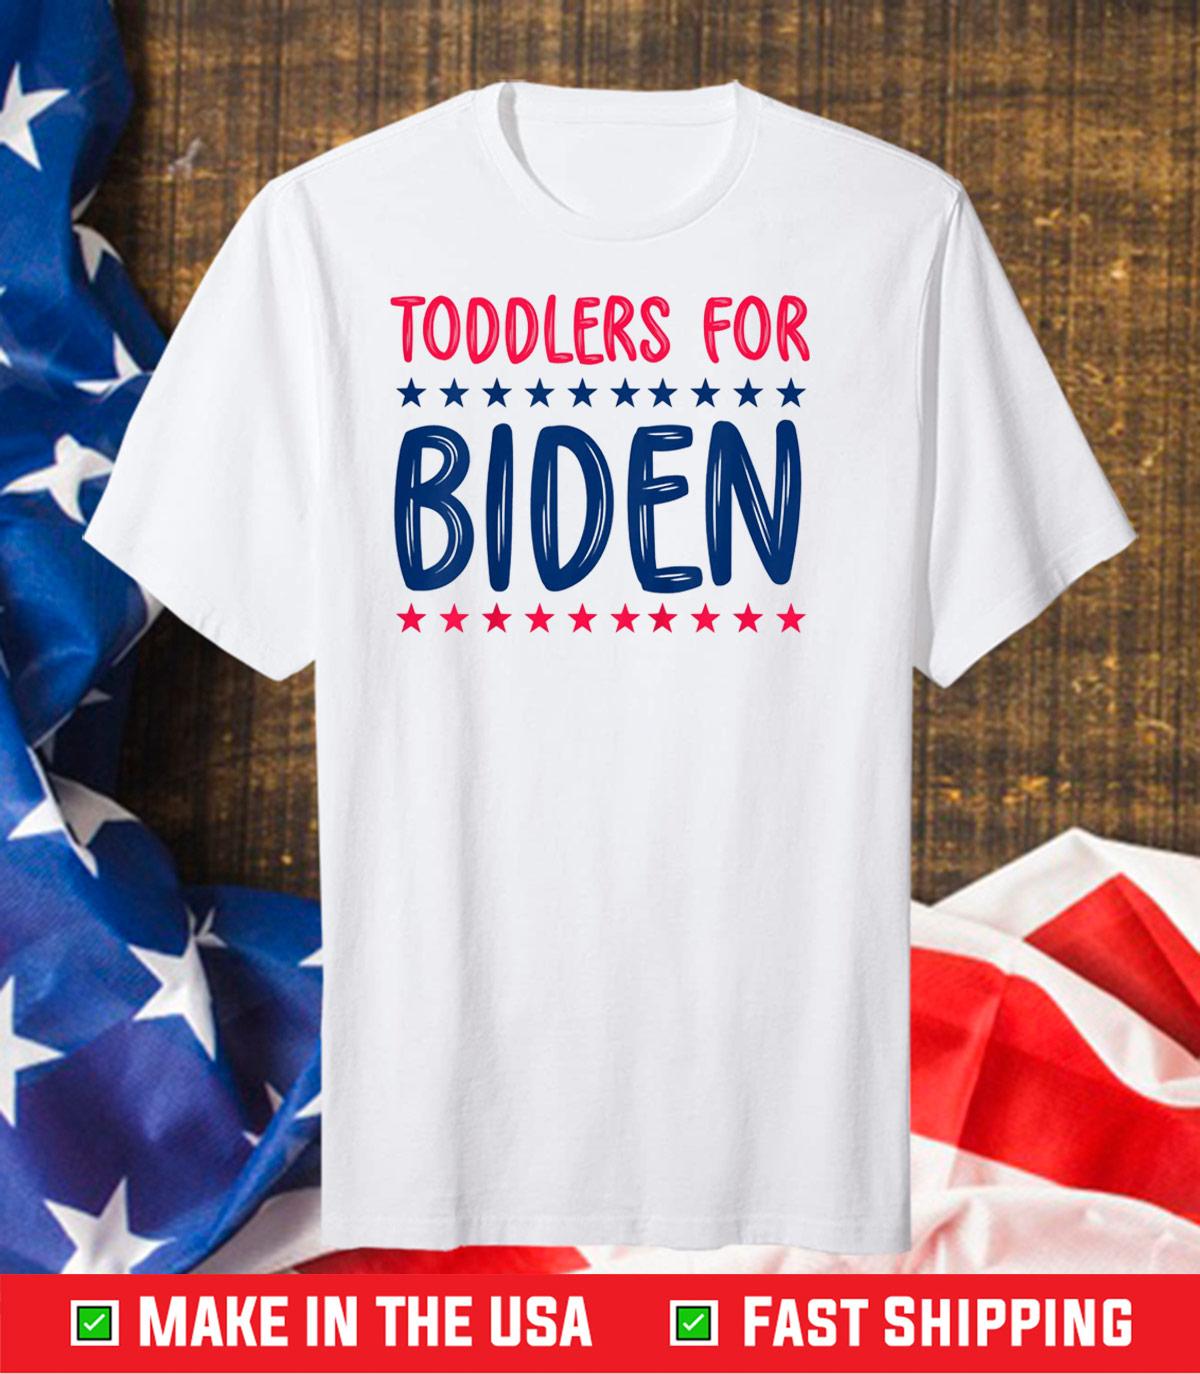 biden harris 2020 shirt Toddlers for Biden Unisex T-Shirts